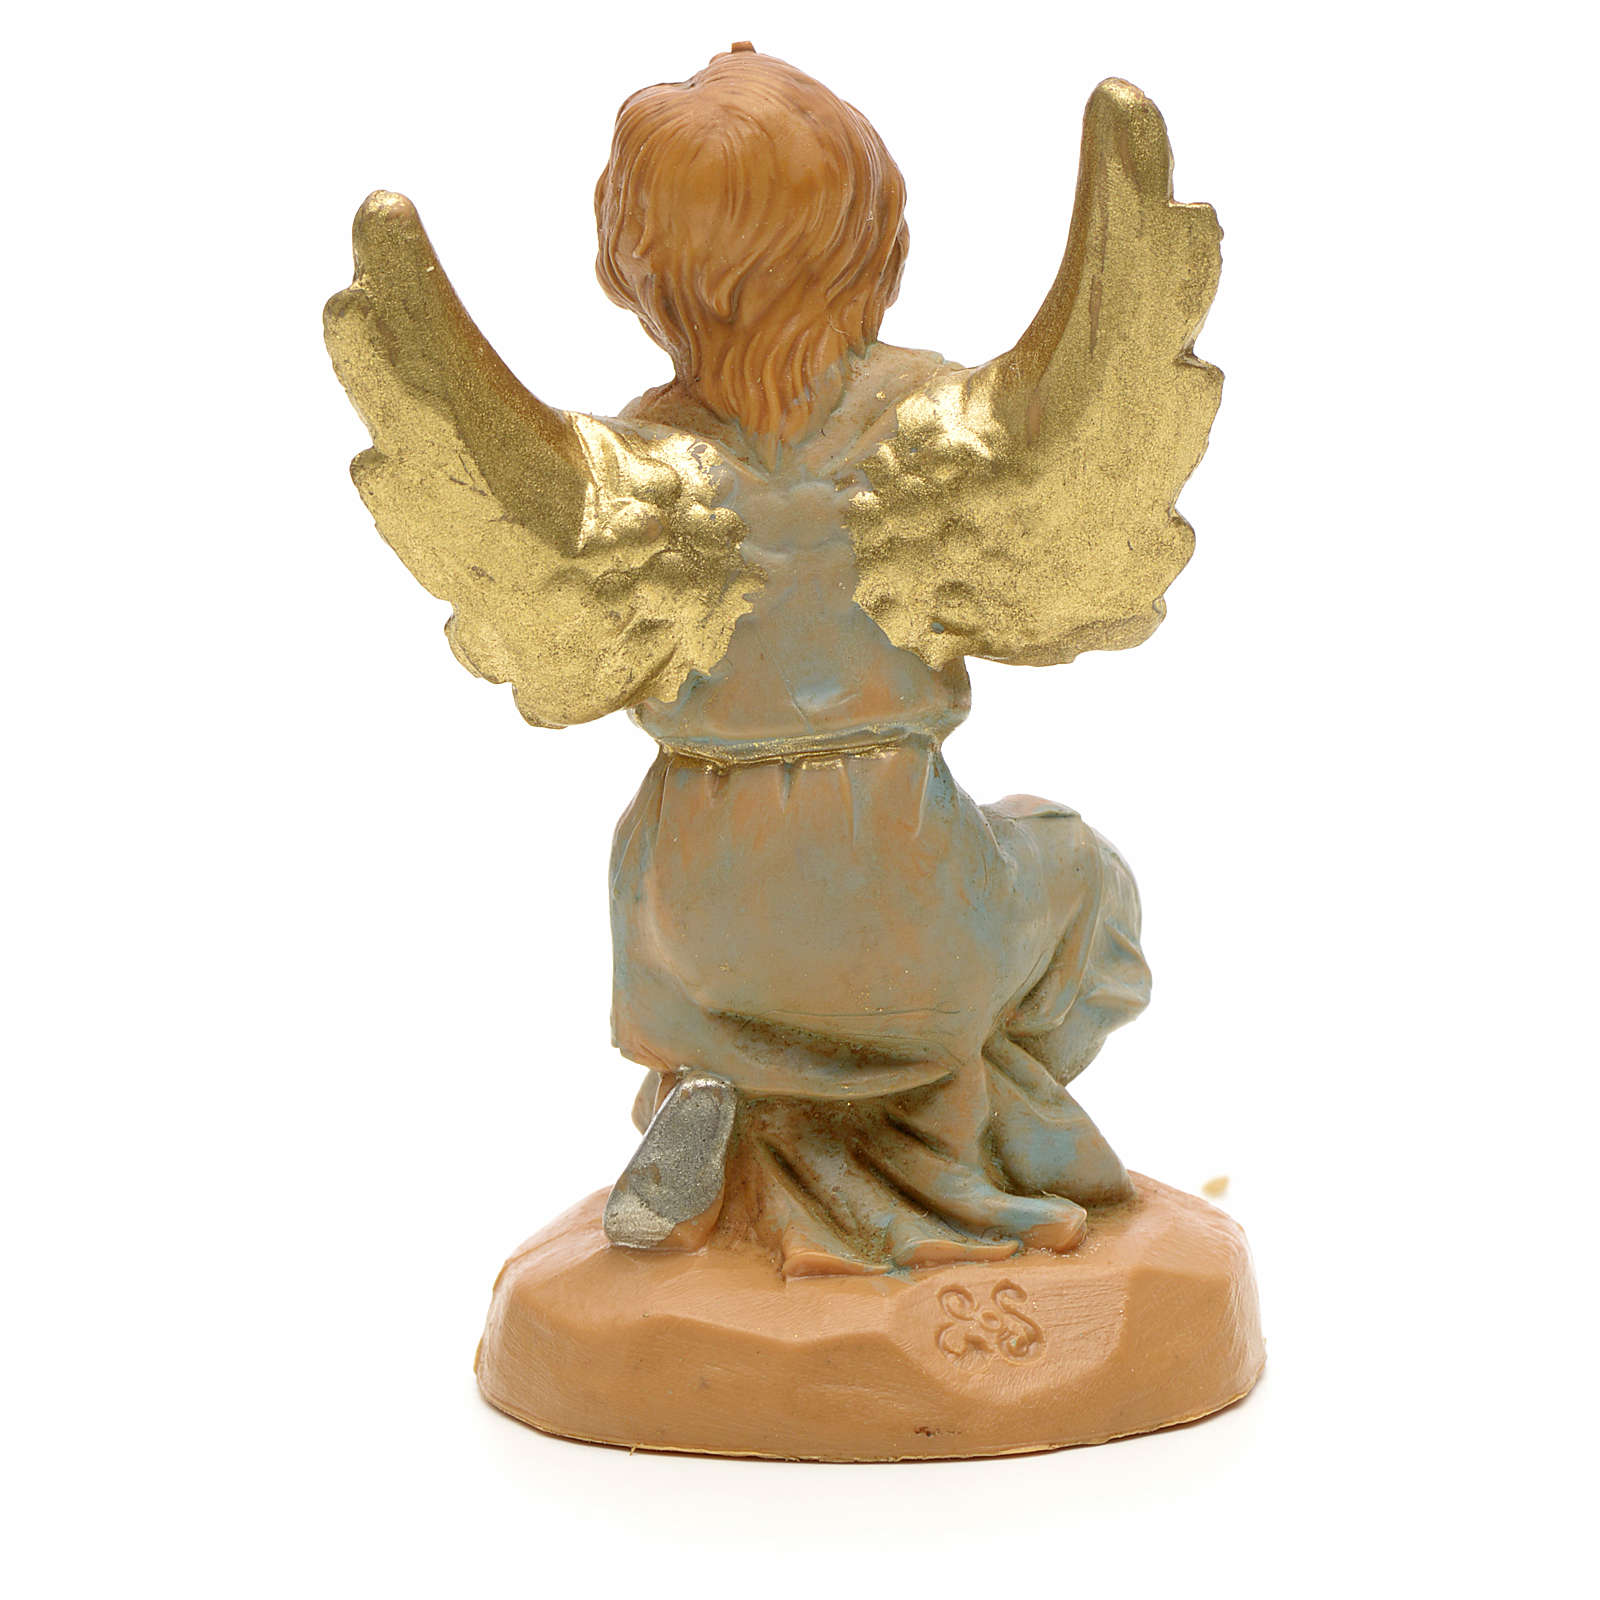 Ange à genoux crèche Fontanini 6,5 cm 4